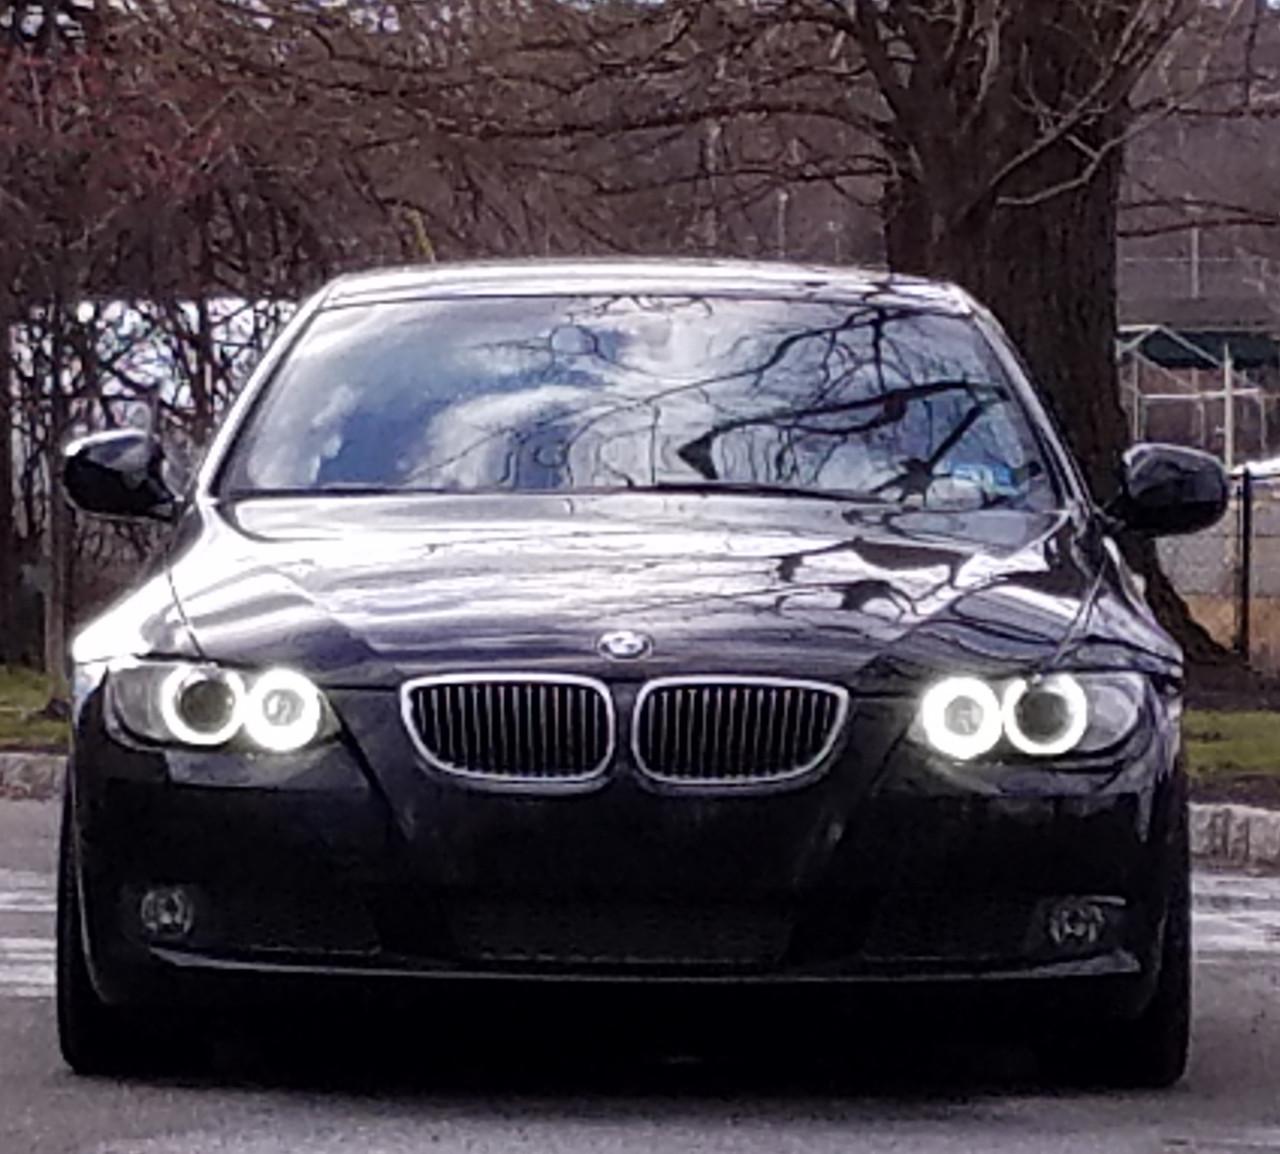 HPB 240 Watt (V2) H8 BMW LED Angel Eye Upgrade BMW E90 / E92 / E82